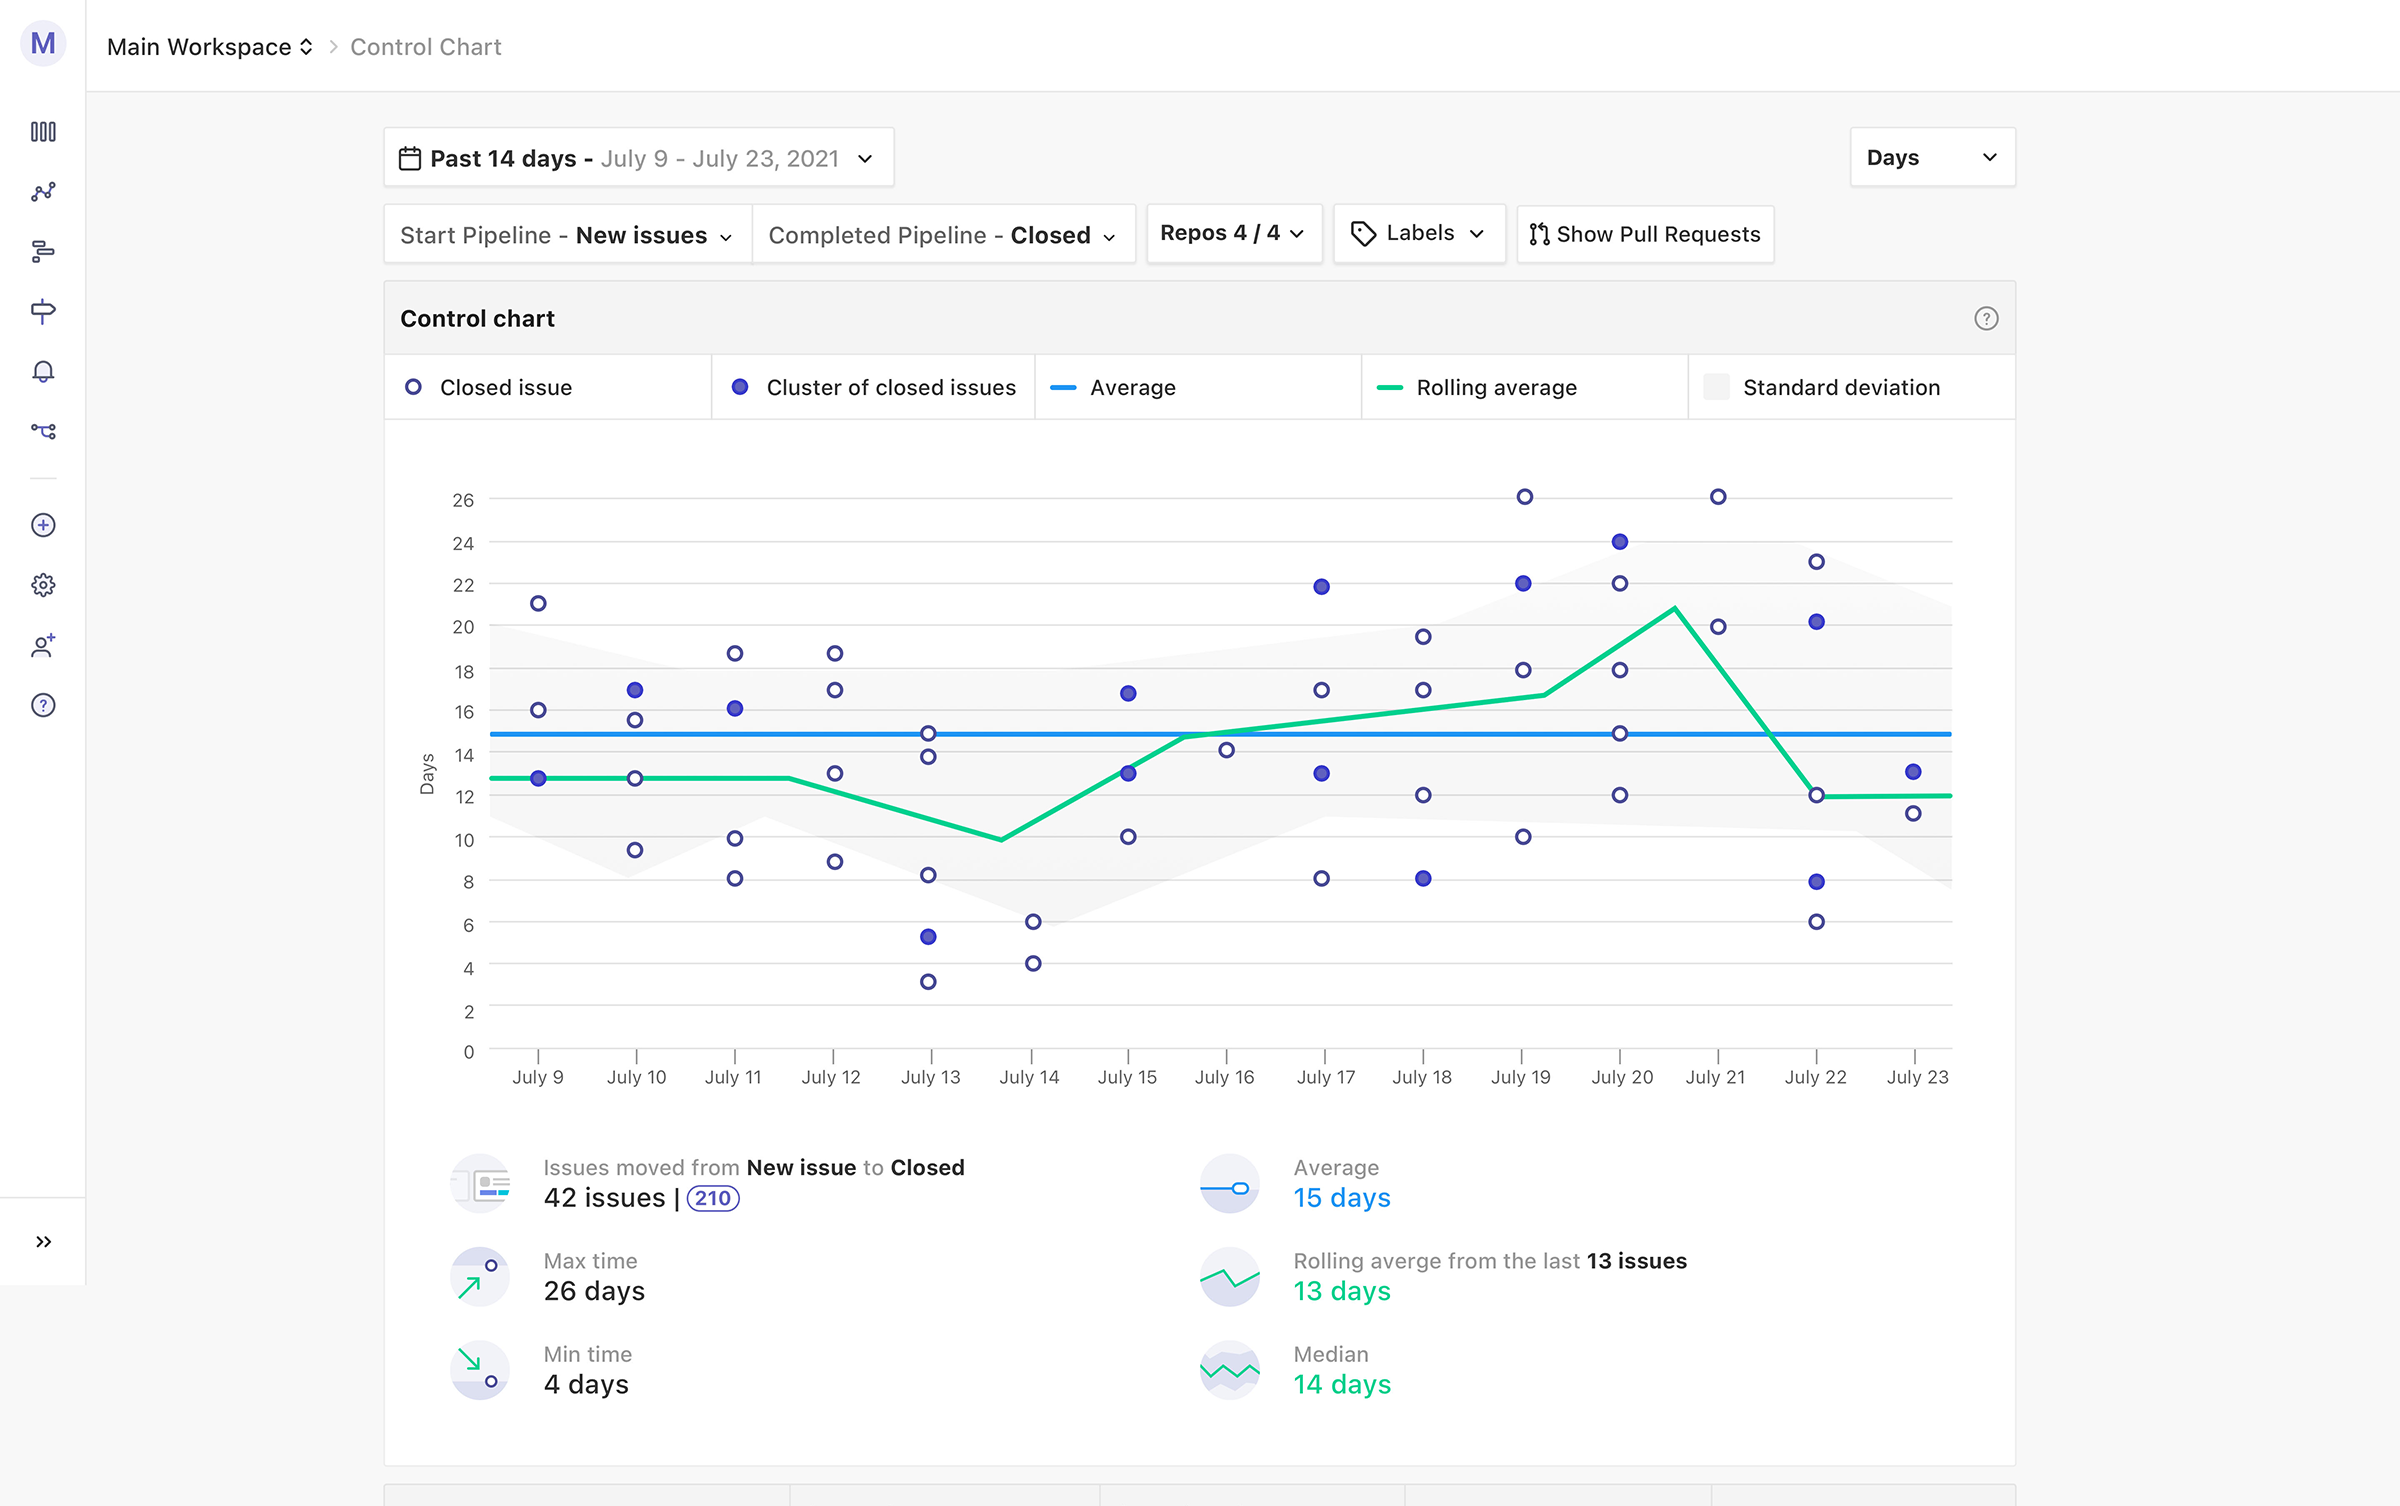 ZenHub Software - Control Chart